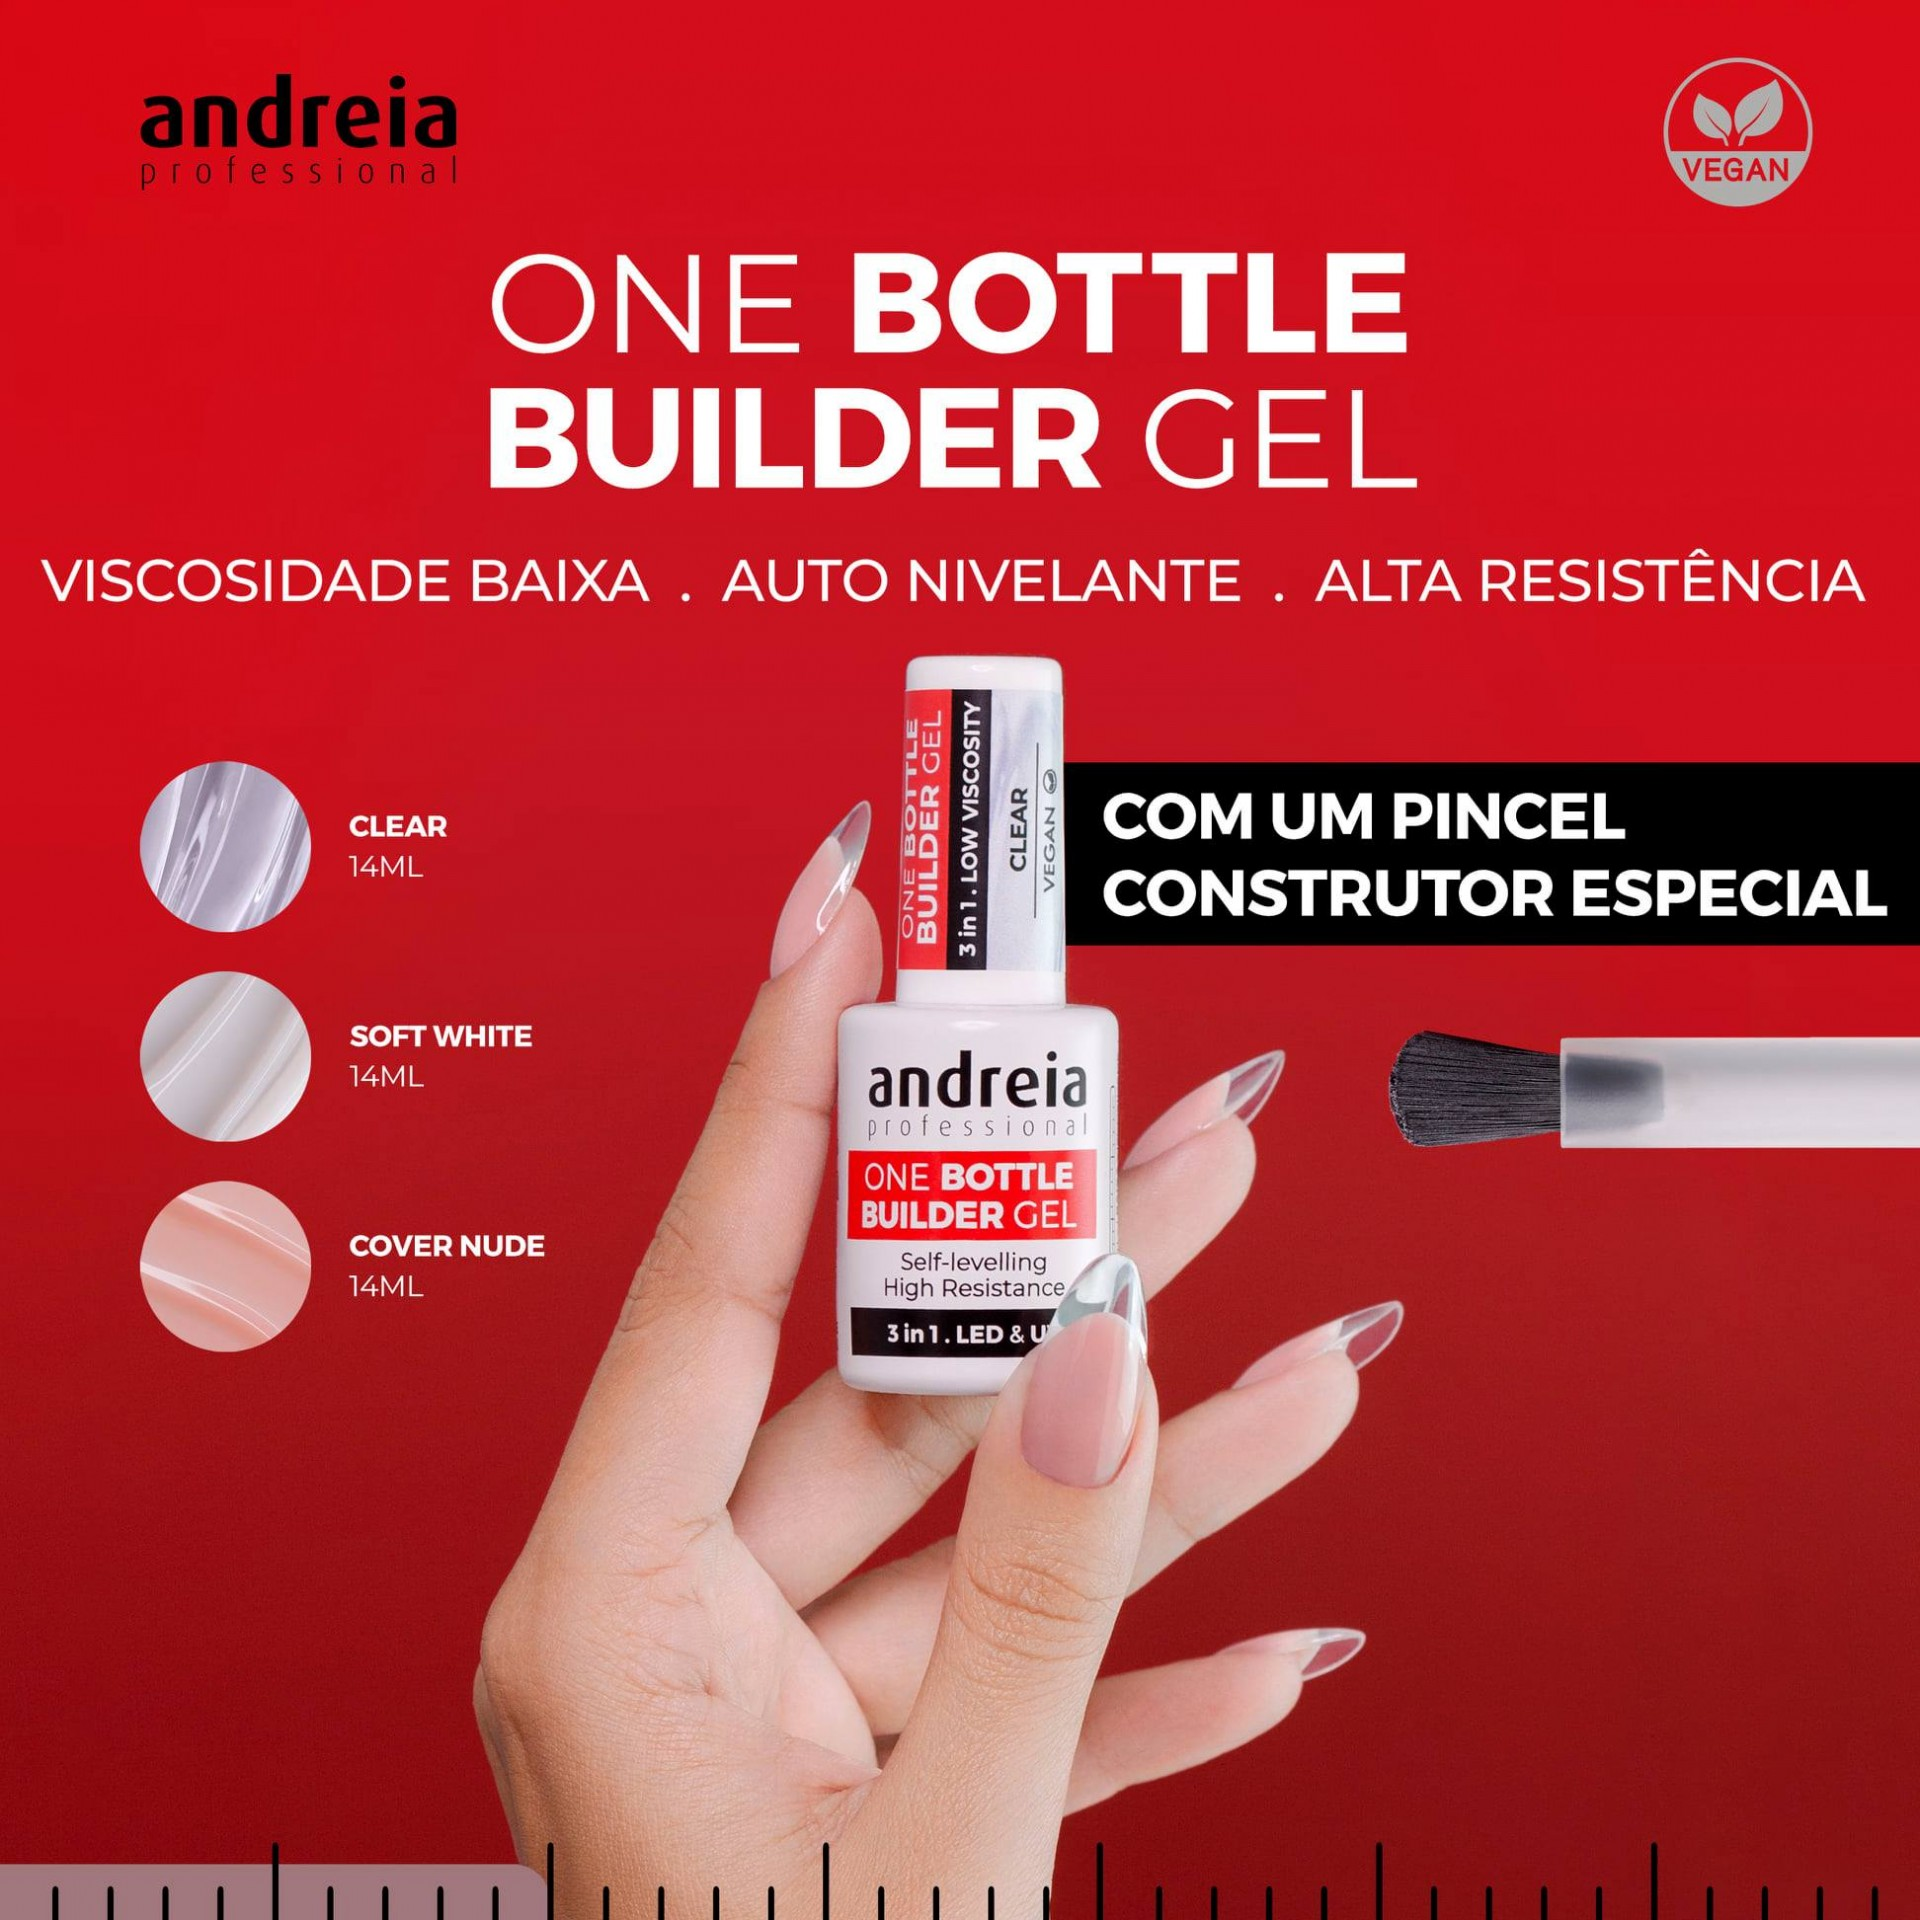 One Bottle Builder Gel Andreia